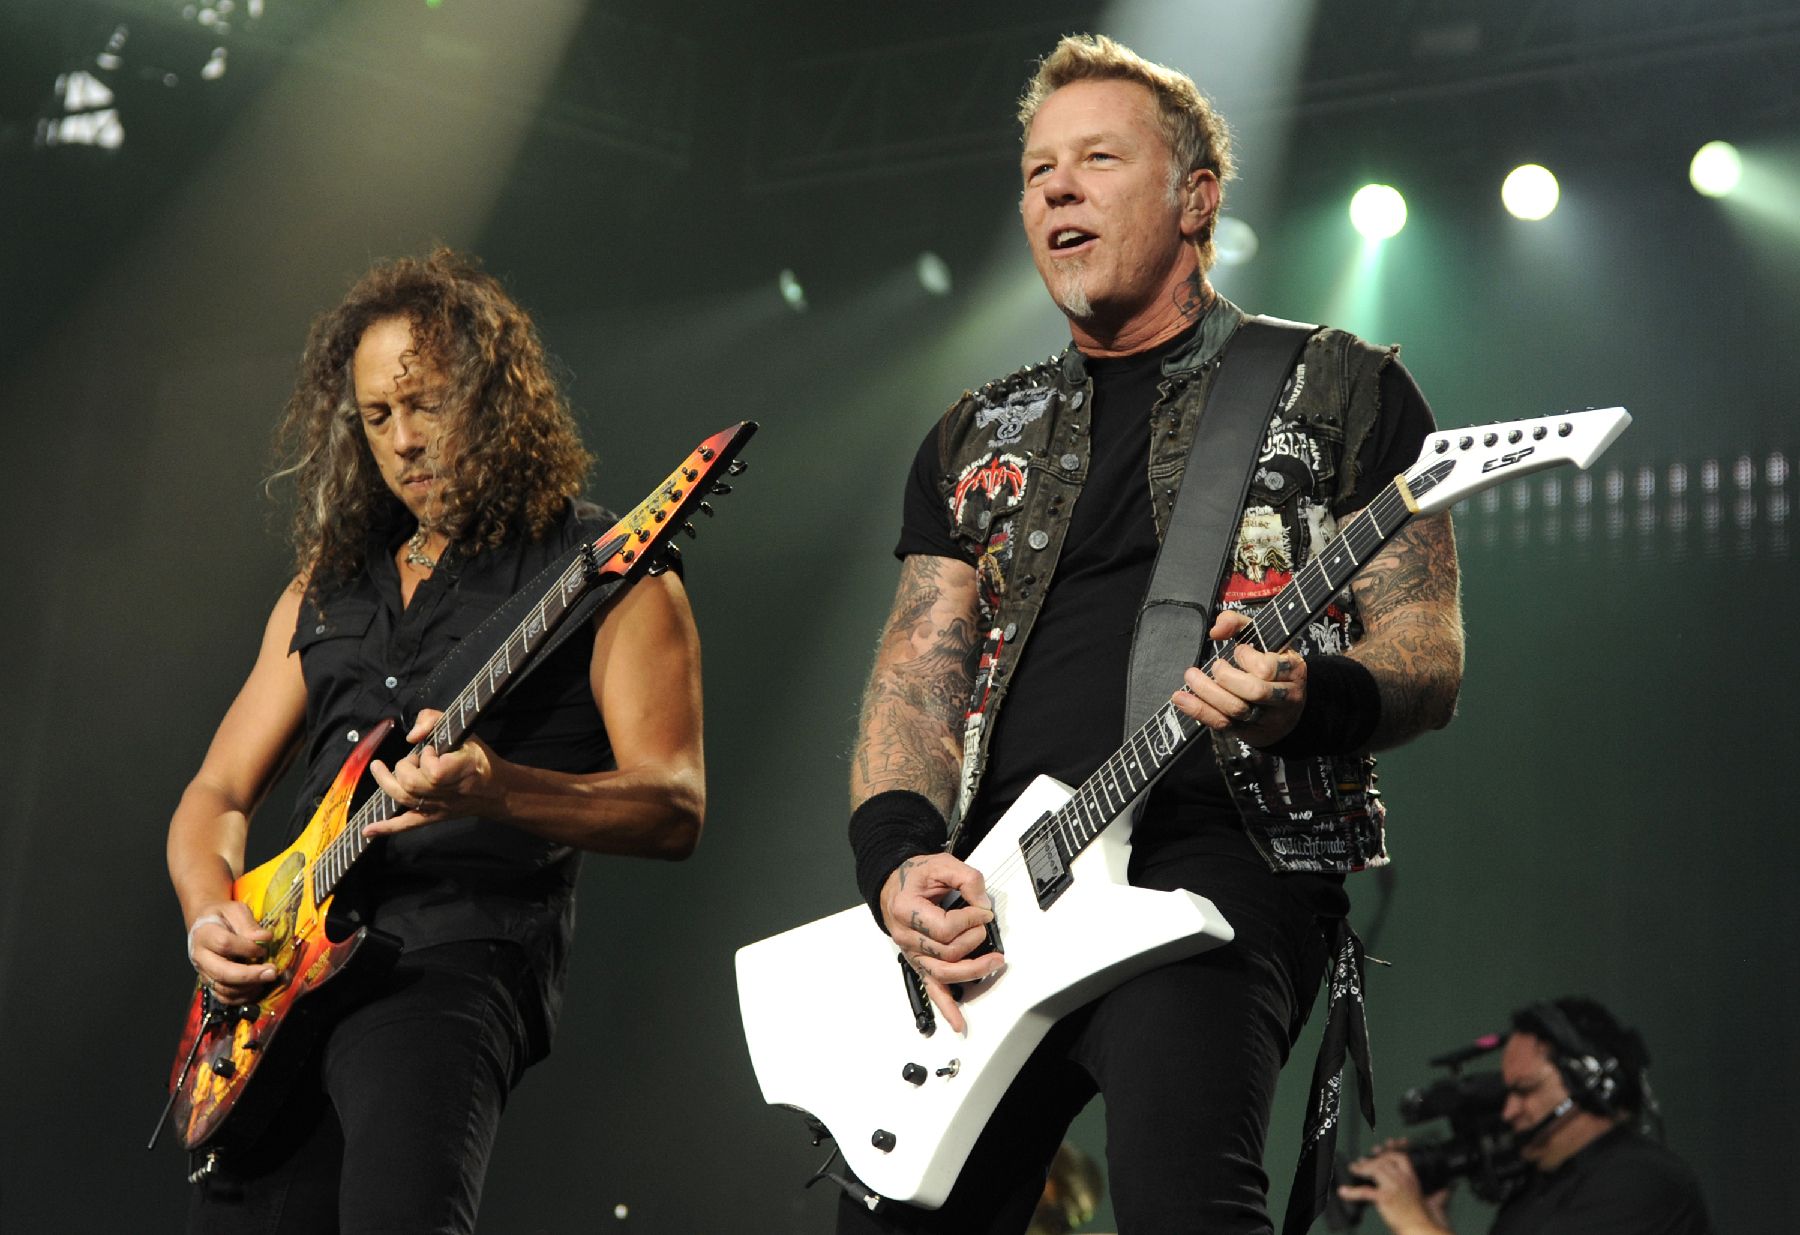 Lars Ulrich on Metallica's Next Album: 'We're One Day Closer'